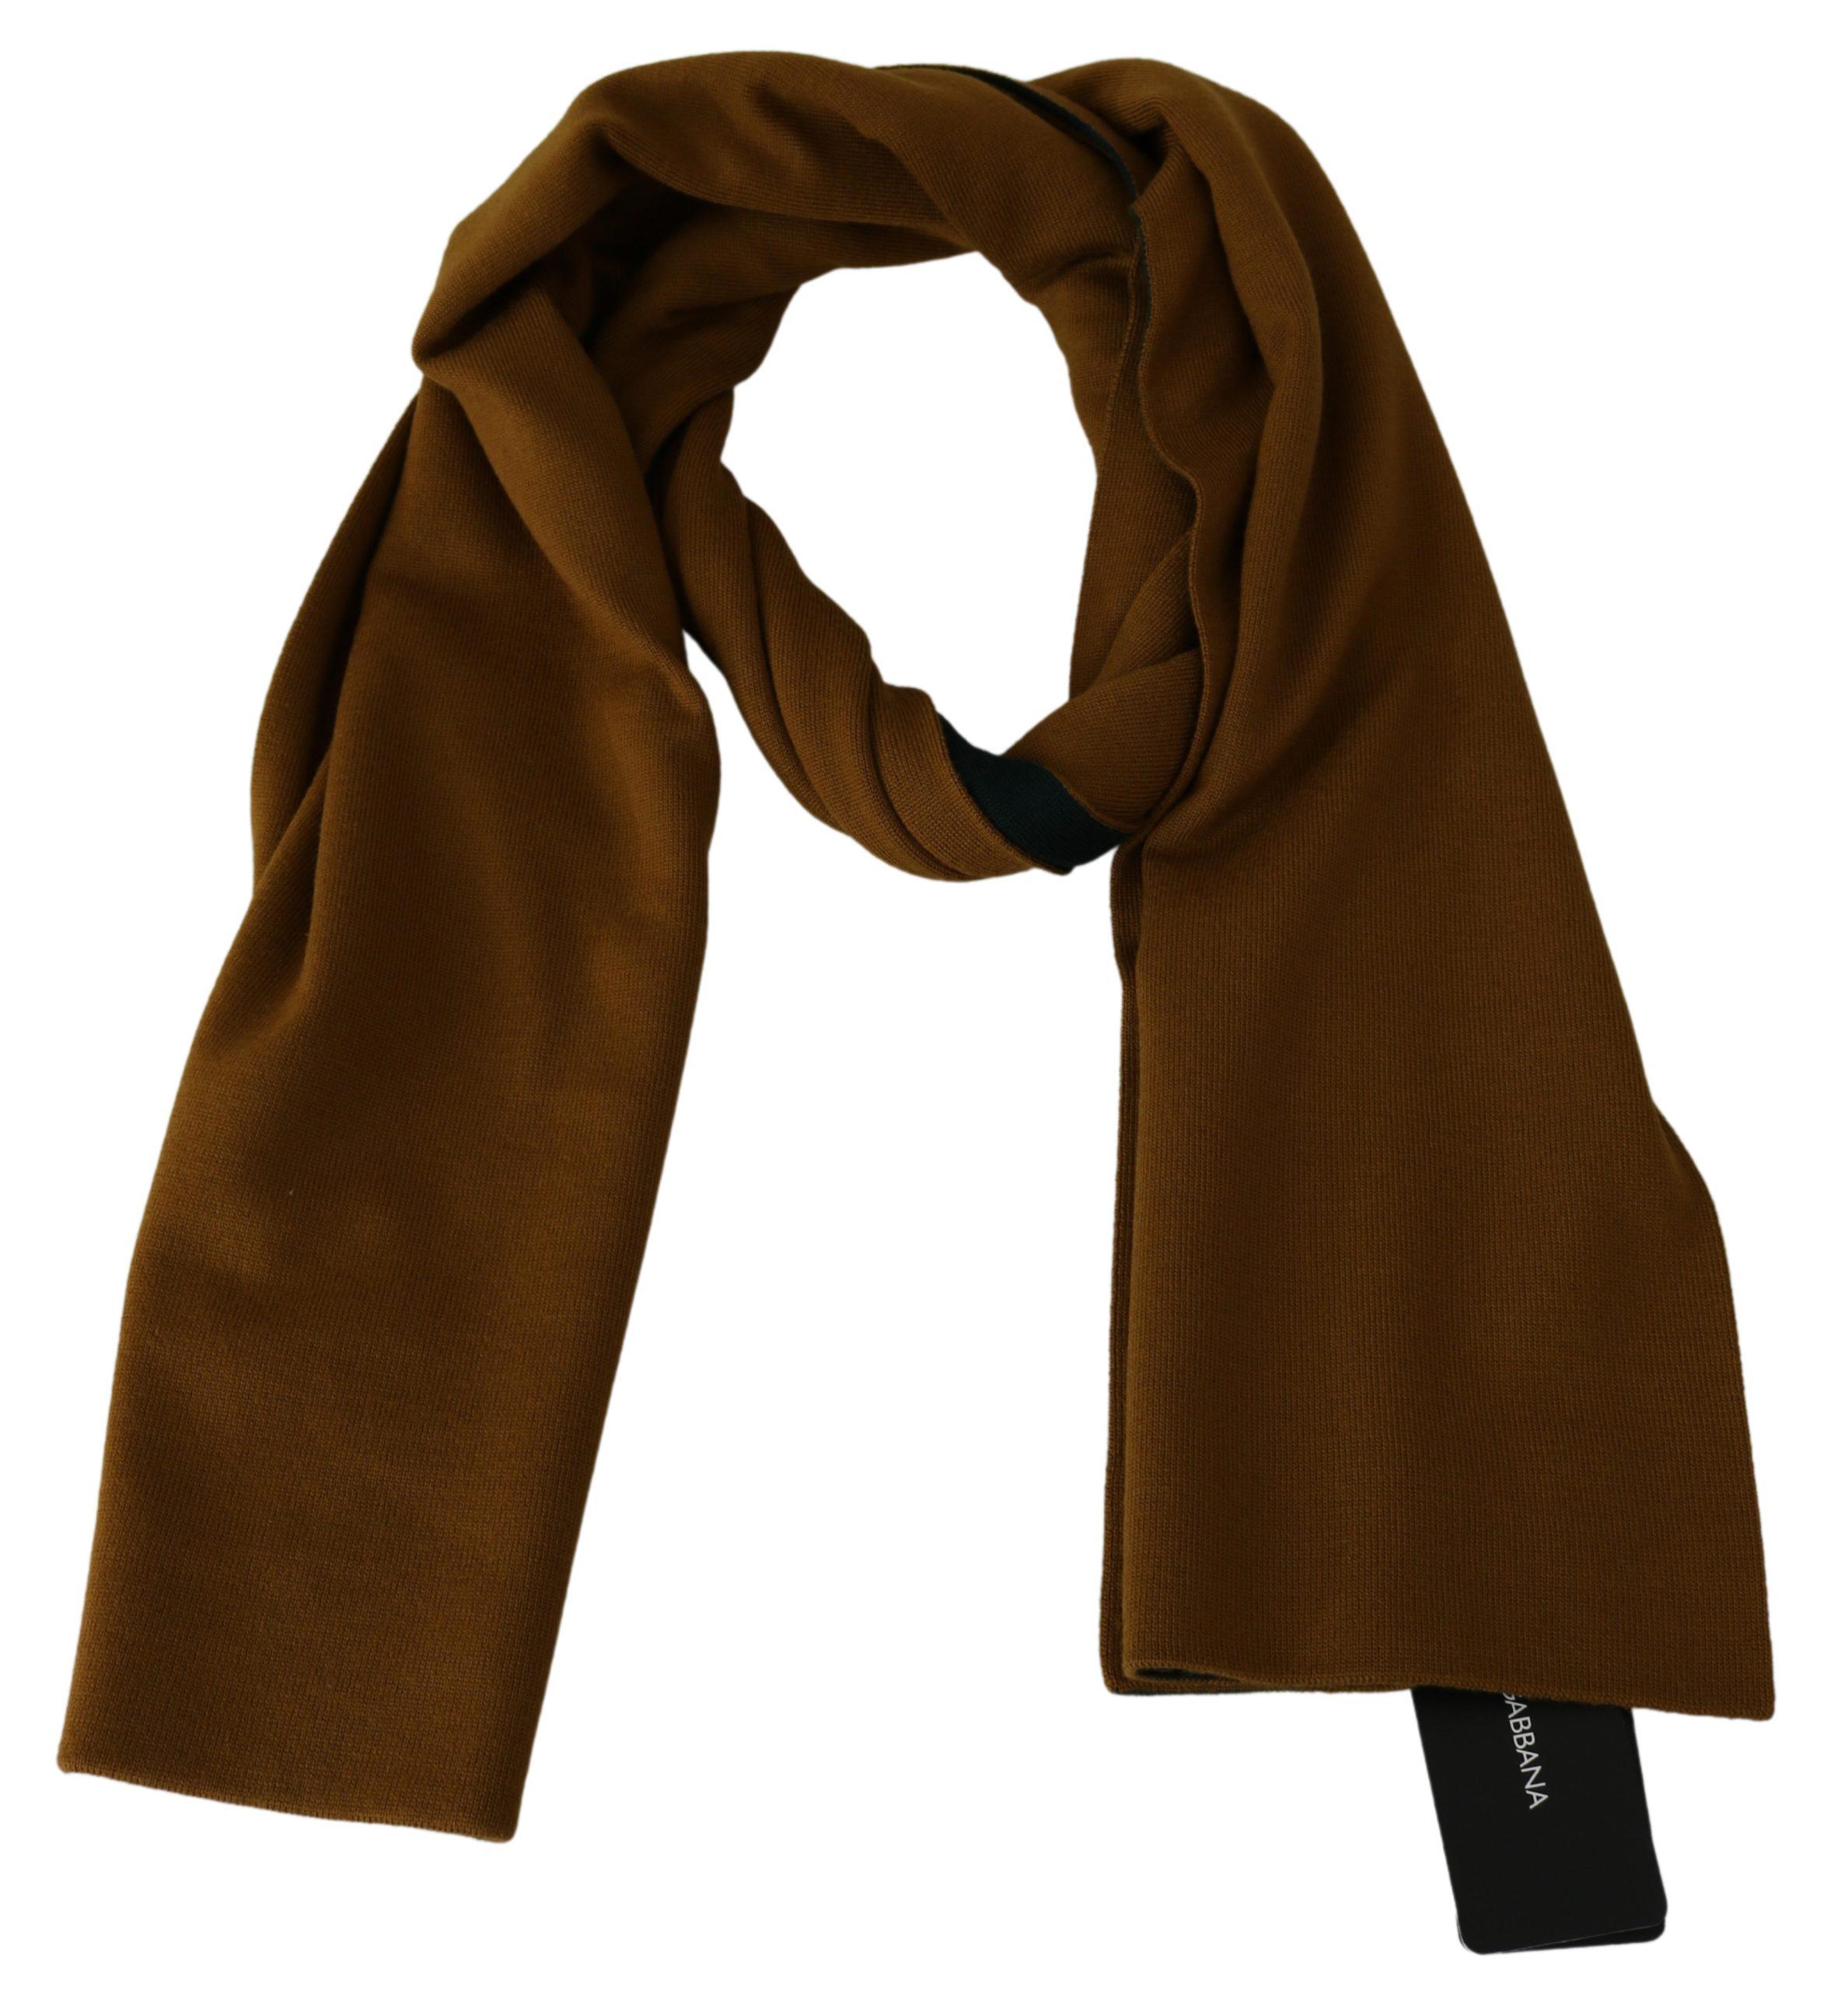 Dolce & Gabbana Men's Wool Wrap Scarf Yellow MS1755BG